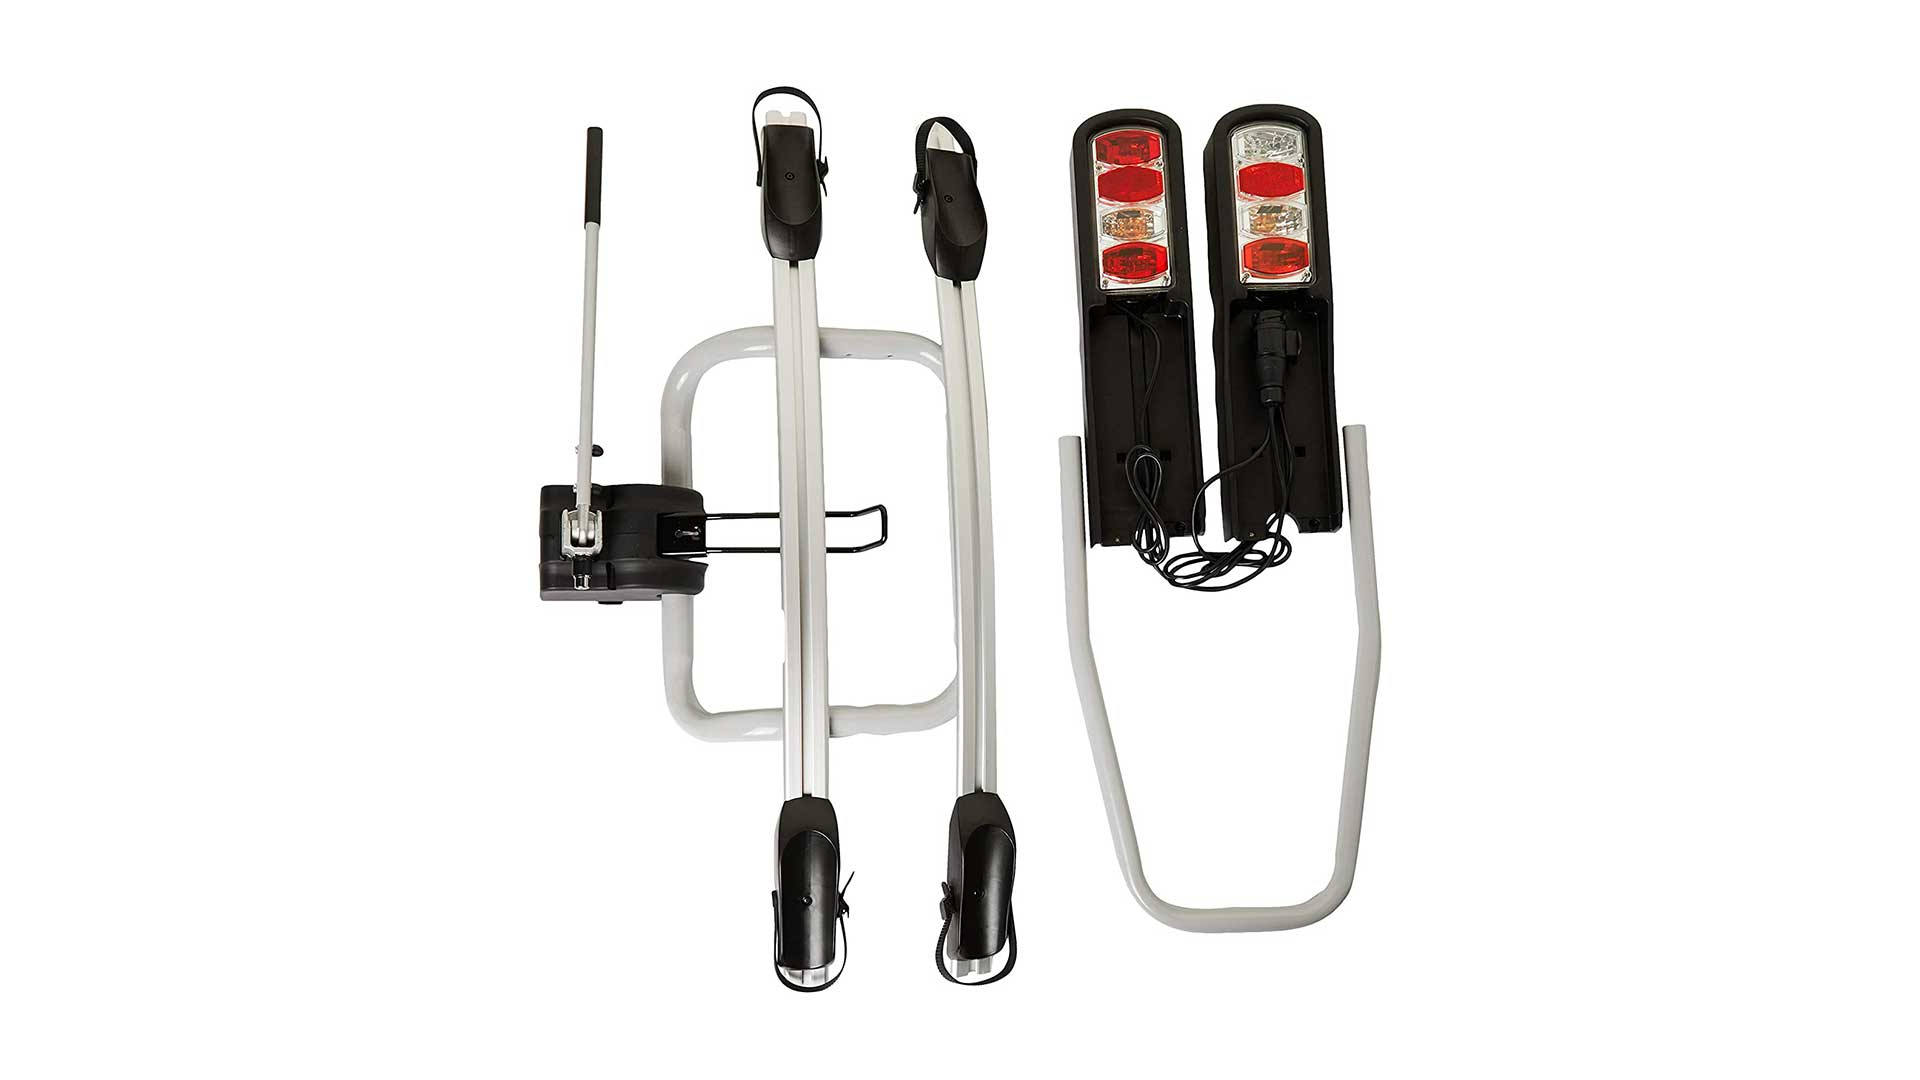 auto companion 2 platform bike rack autoc-18